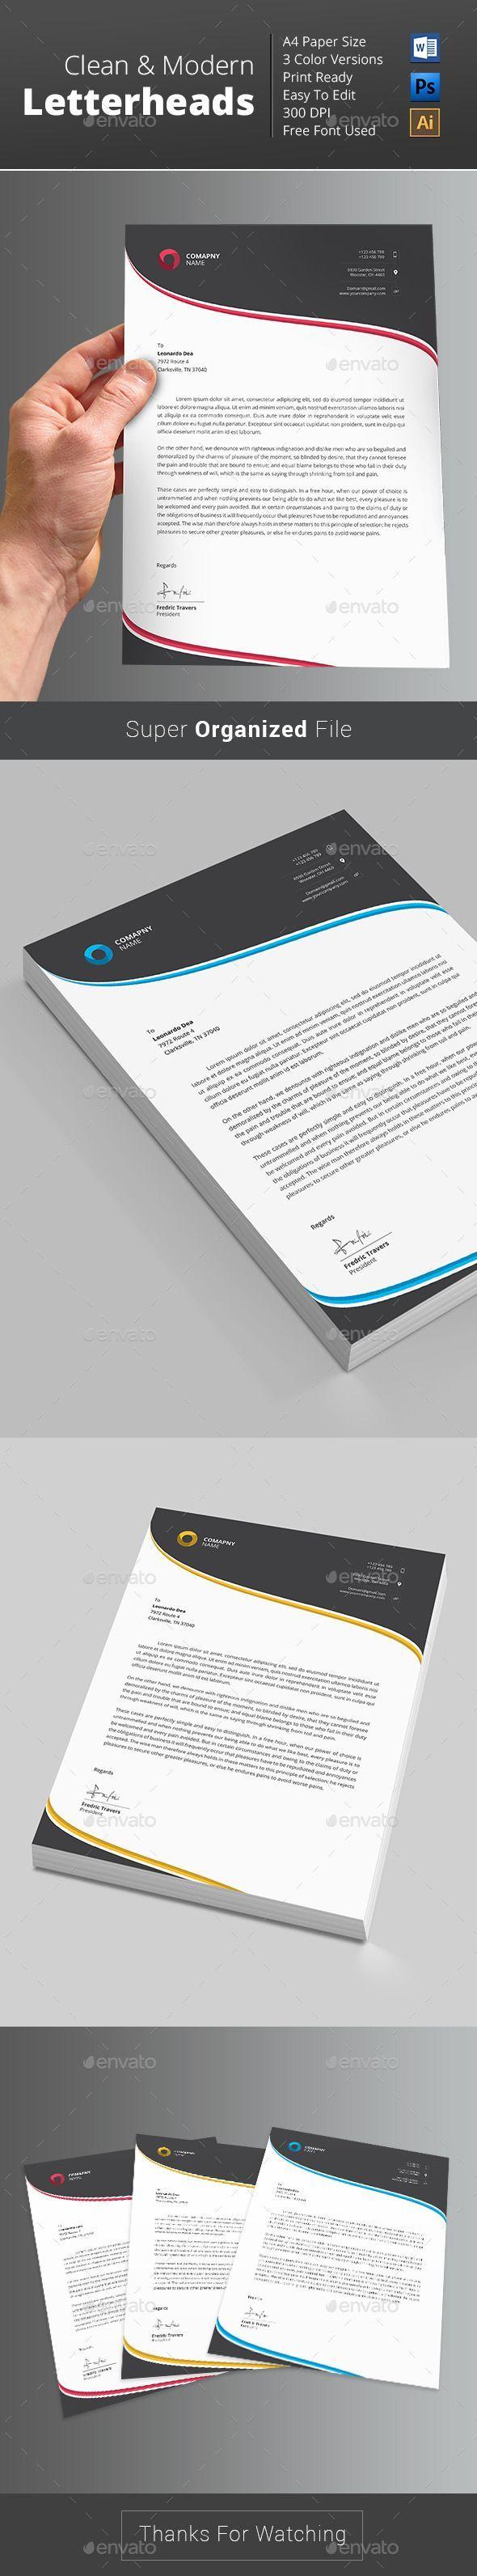 Letterhead Template PSD, Vector AI. Download here: http://graphicriver.net/item/letterhead/12987178?s_rank=1052&ref=yinkira